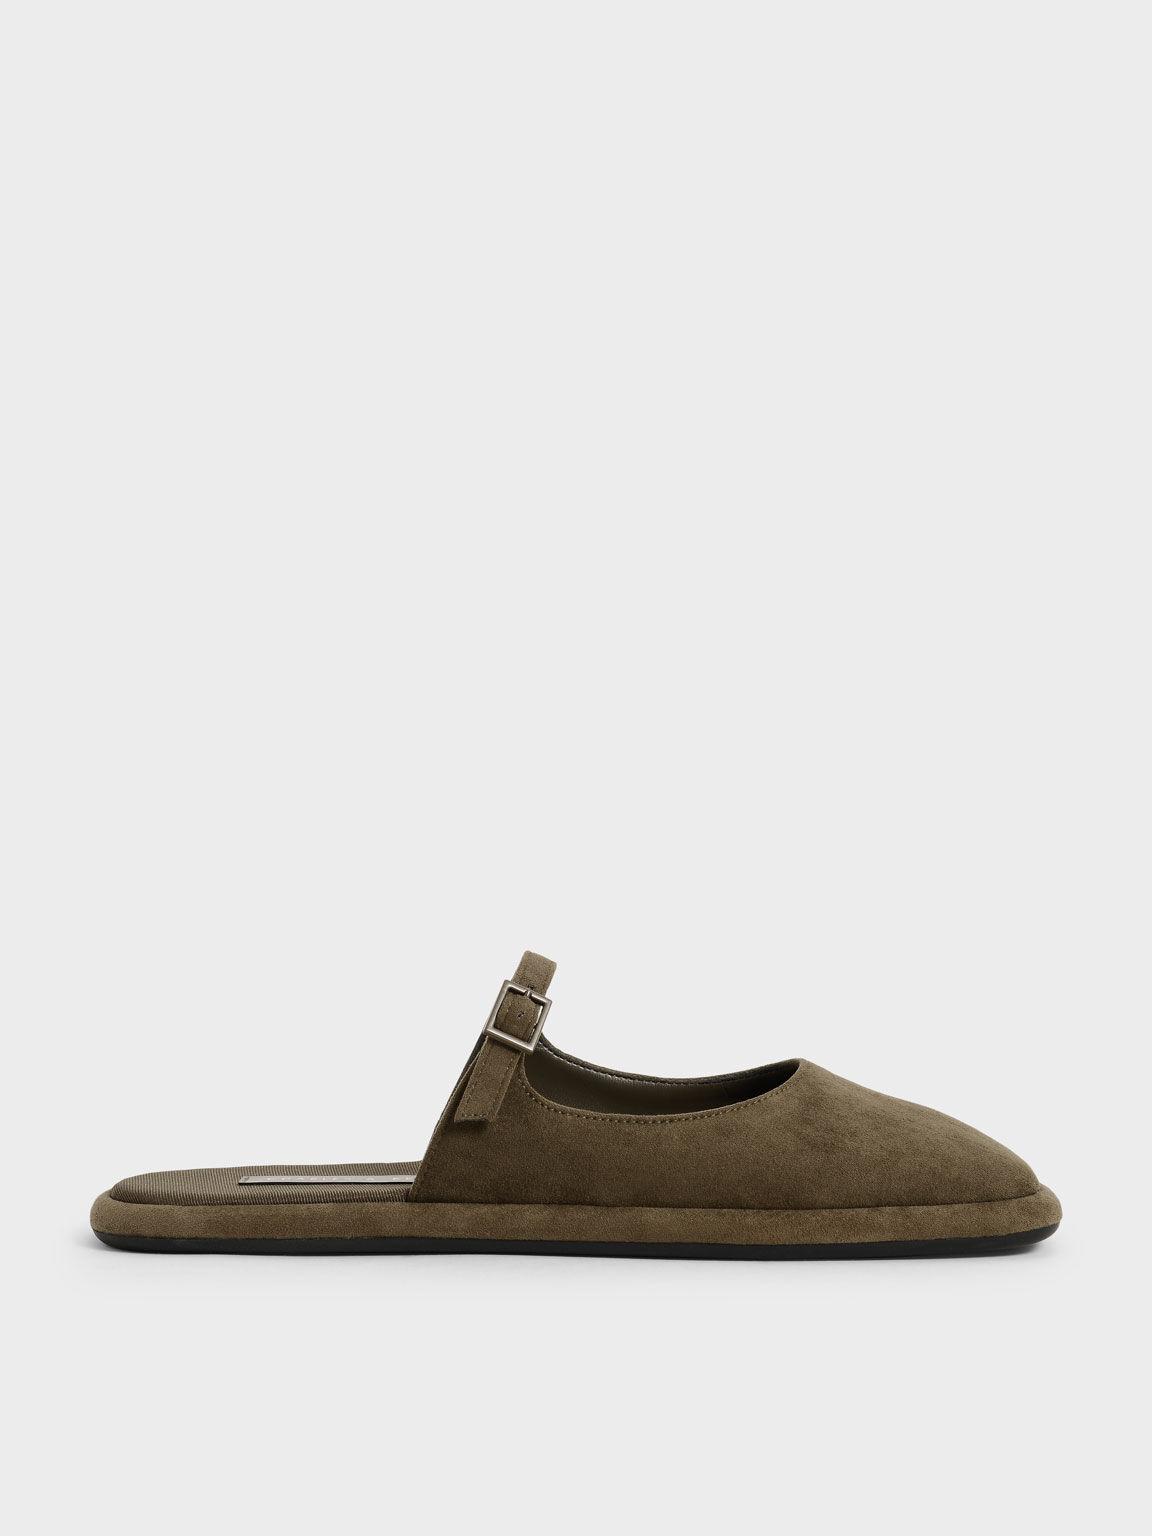 Textured Square-Toe Flat Mules, Olive, hi-res